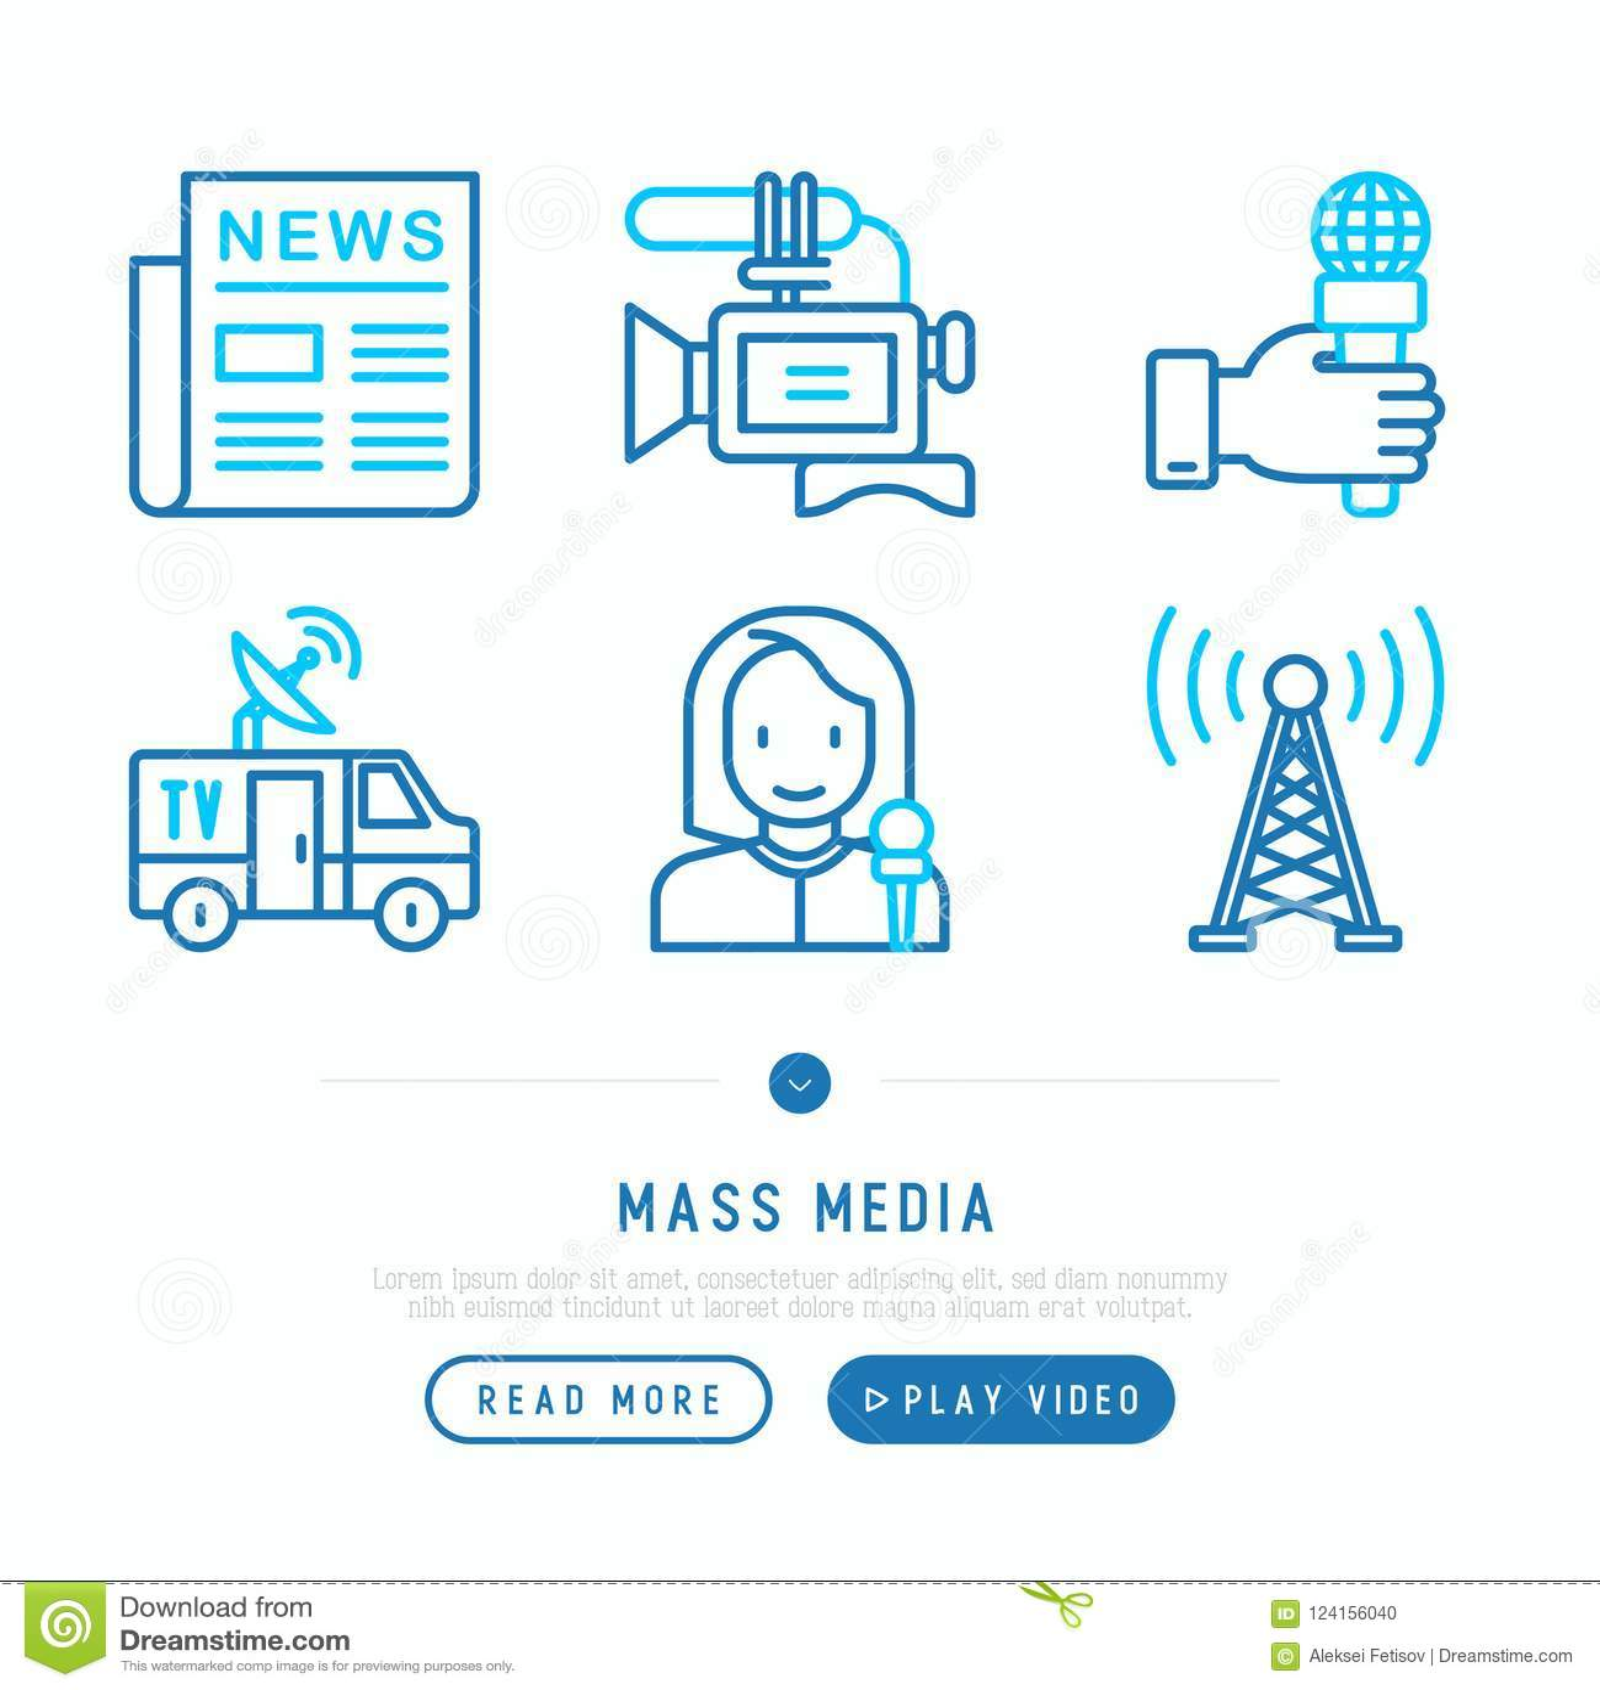 Mass media thin line icons set: newspaper, article, blog, report